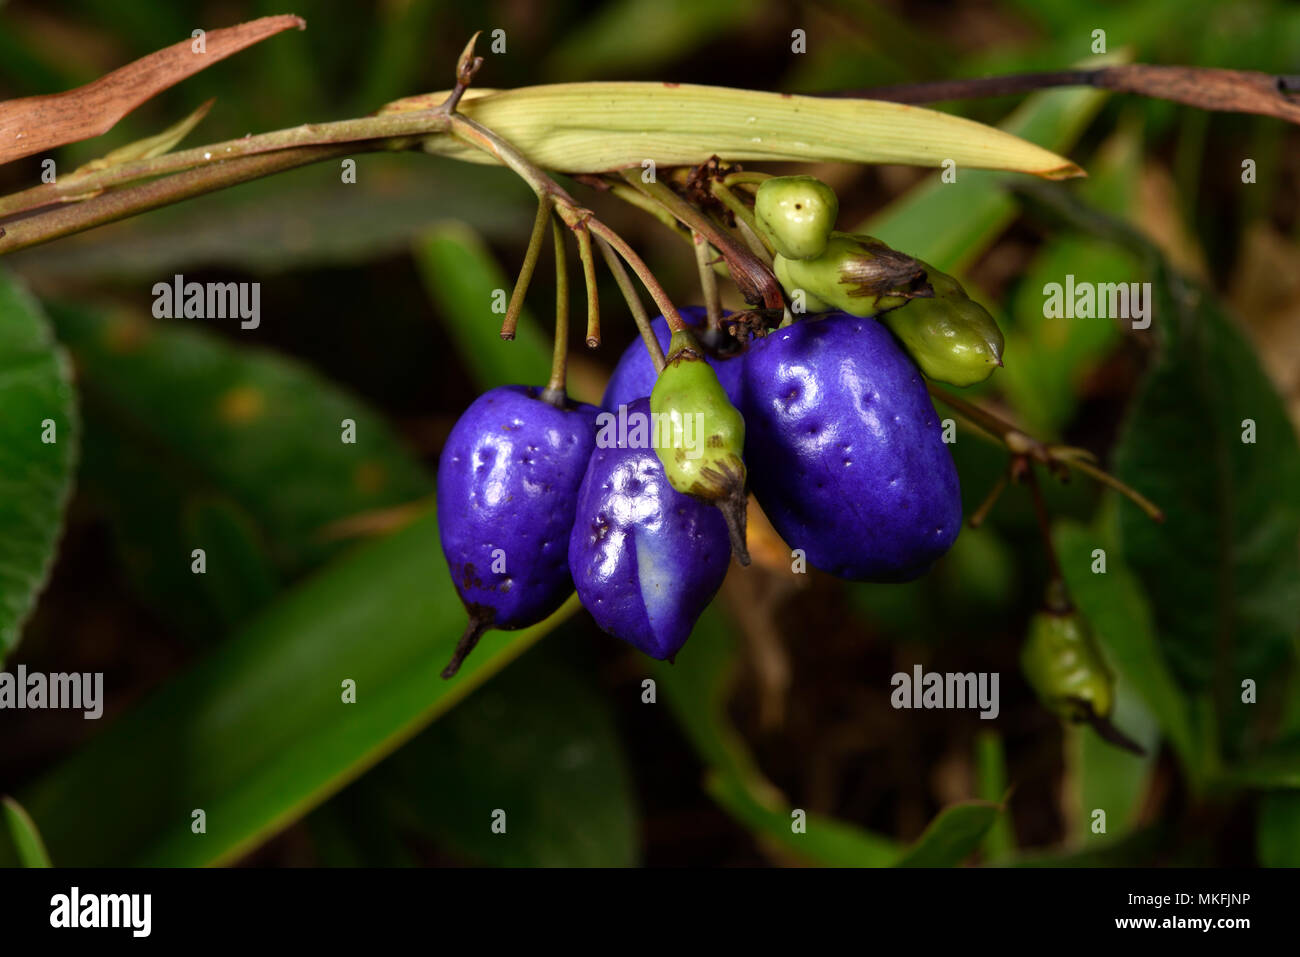 Dianella (Dianella ensifolia) fruits, Andasibe, Perinet, Alaotra-Mangoro Region, Madagascar Stock Photo